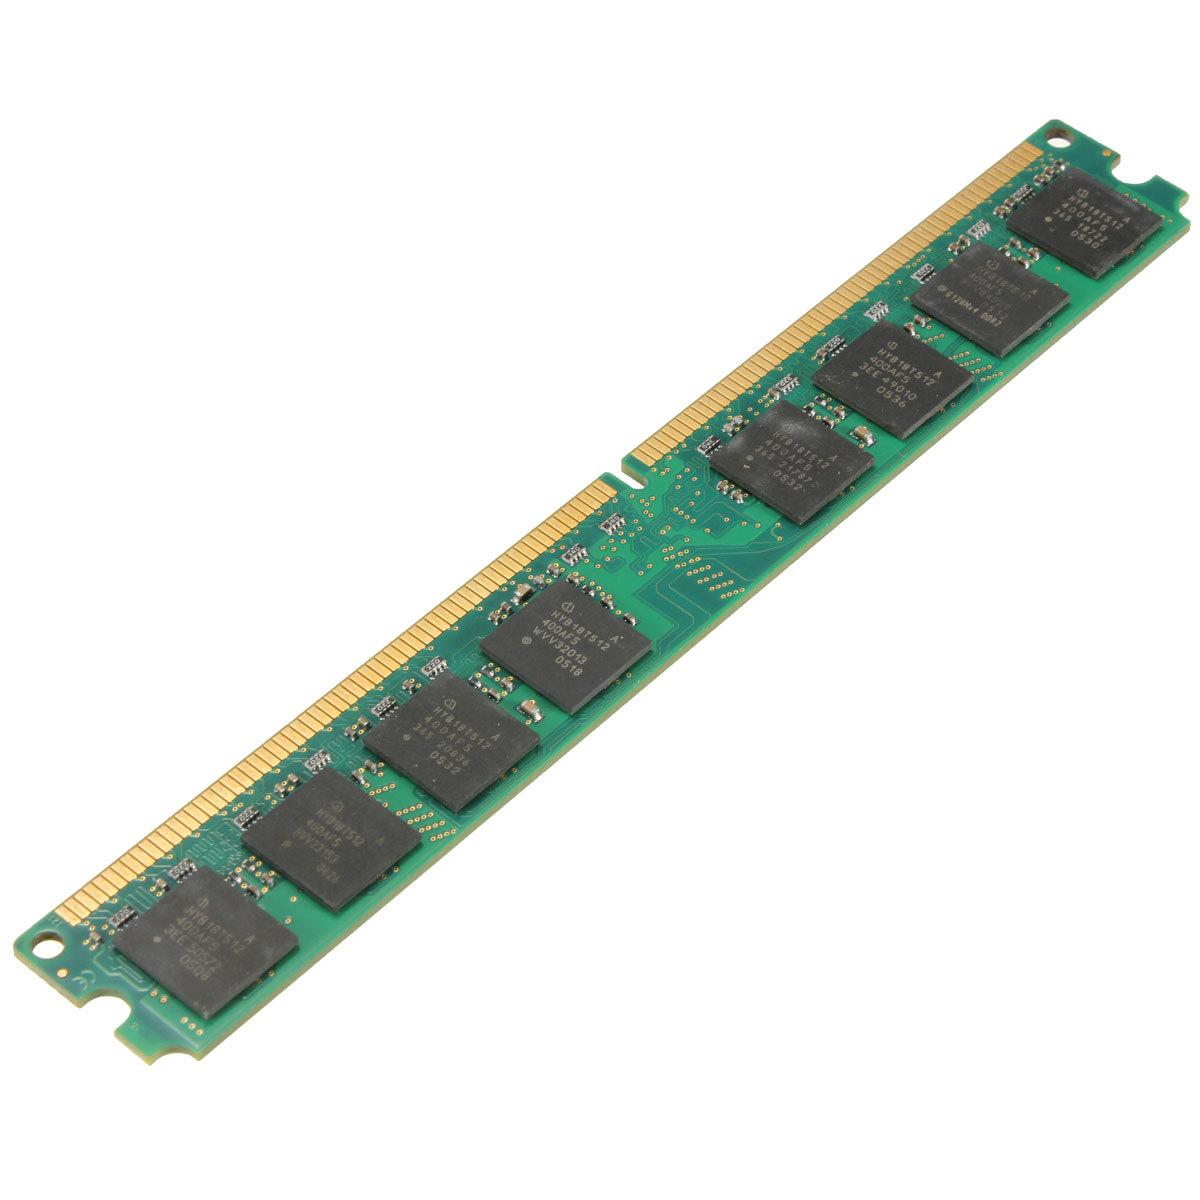 1 GB DDR2 PC2-5300 667 mhz PC desktop DIMM memori memukul .